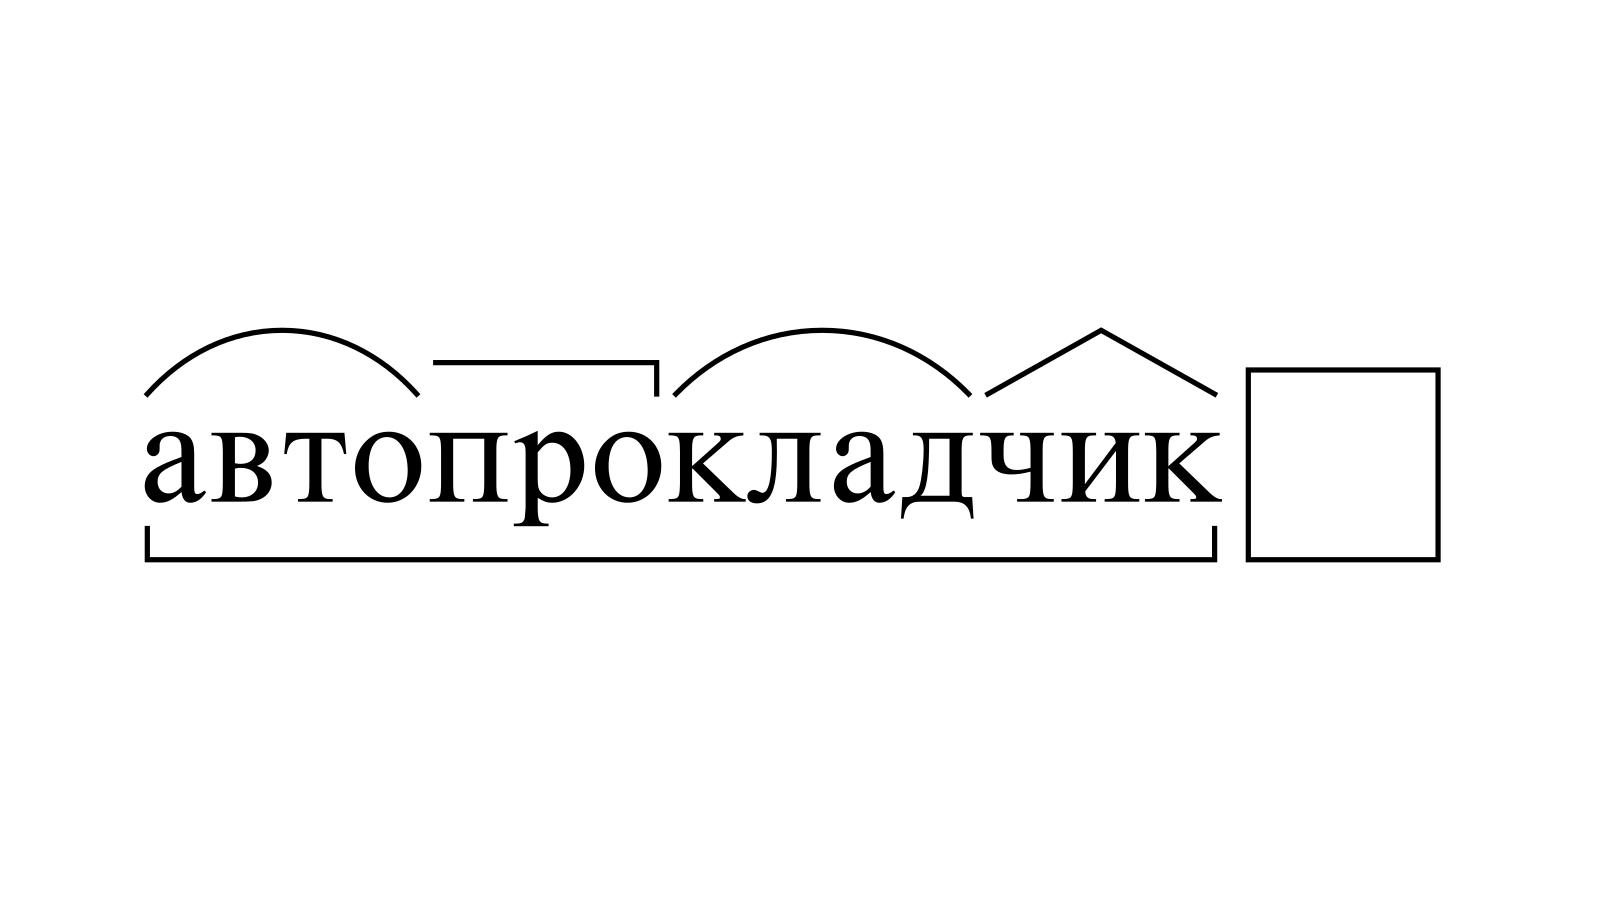 Разбор слова «автопрокладчик» по составу